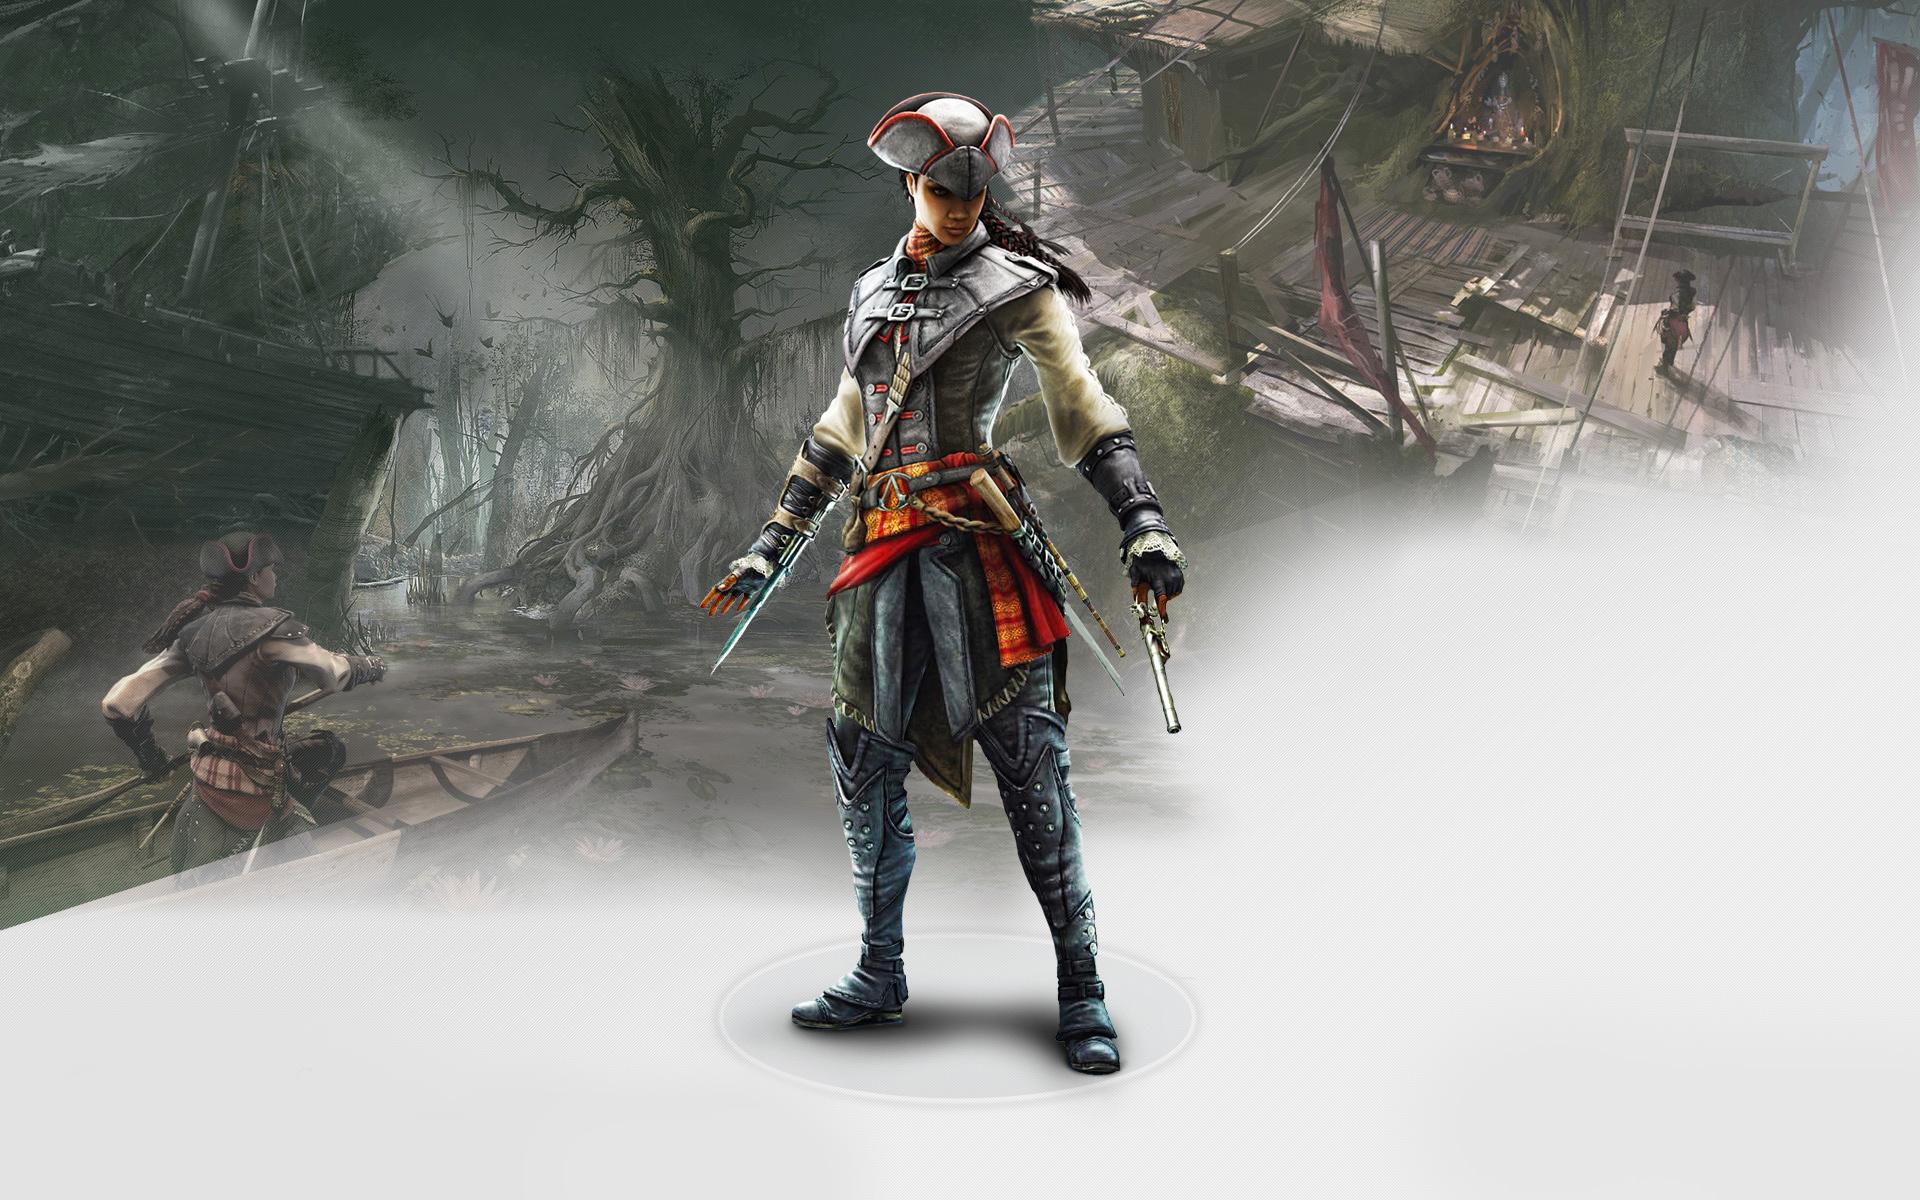 Assassins Creed Unity Hd Wallpaper Assassin S Creed Iii Liberation Hd Wallpaper Background